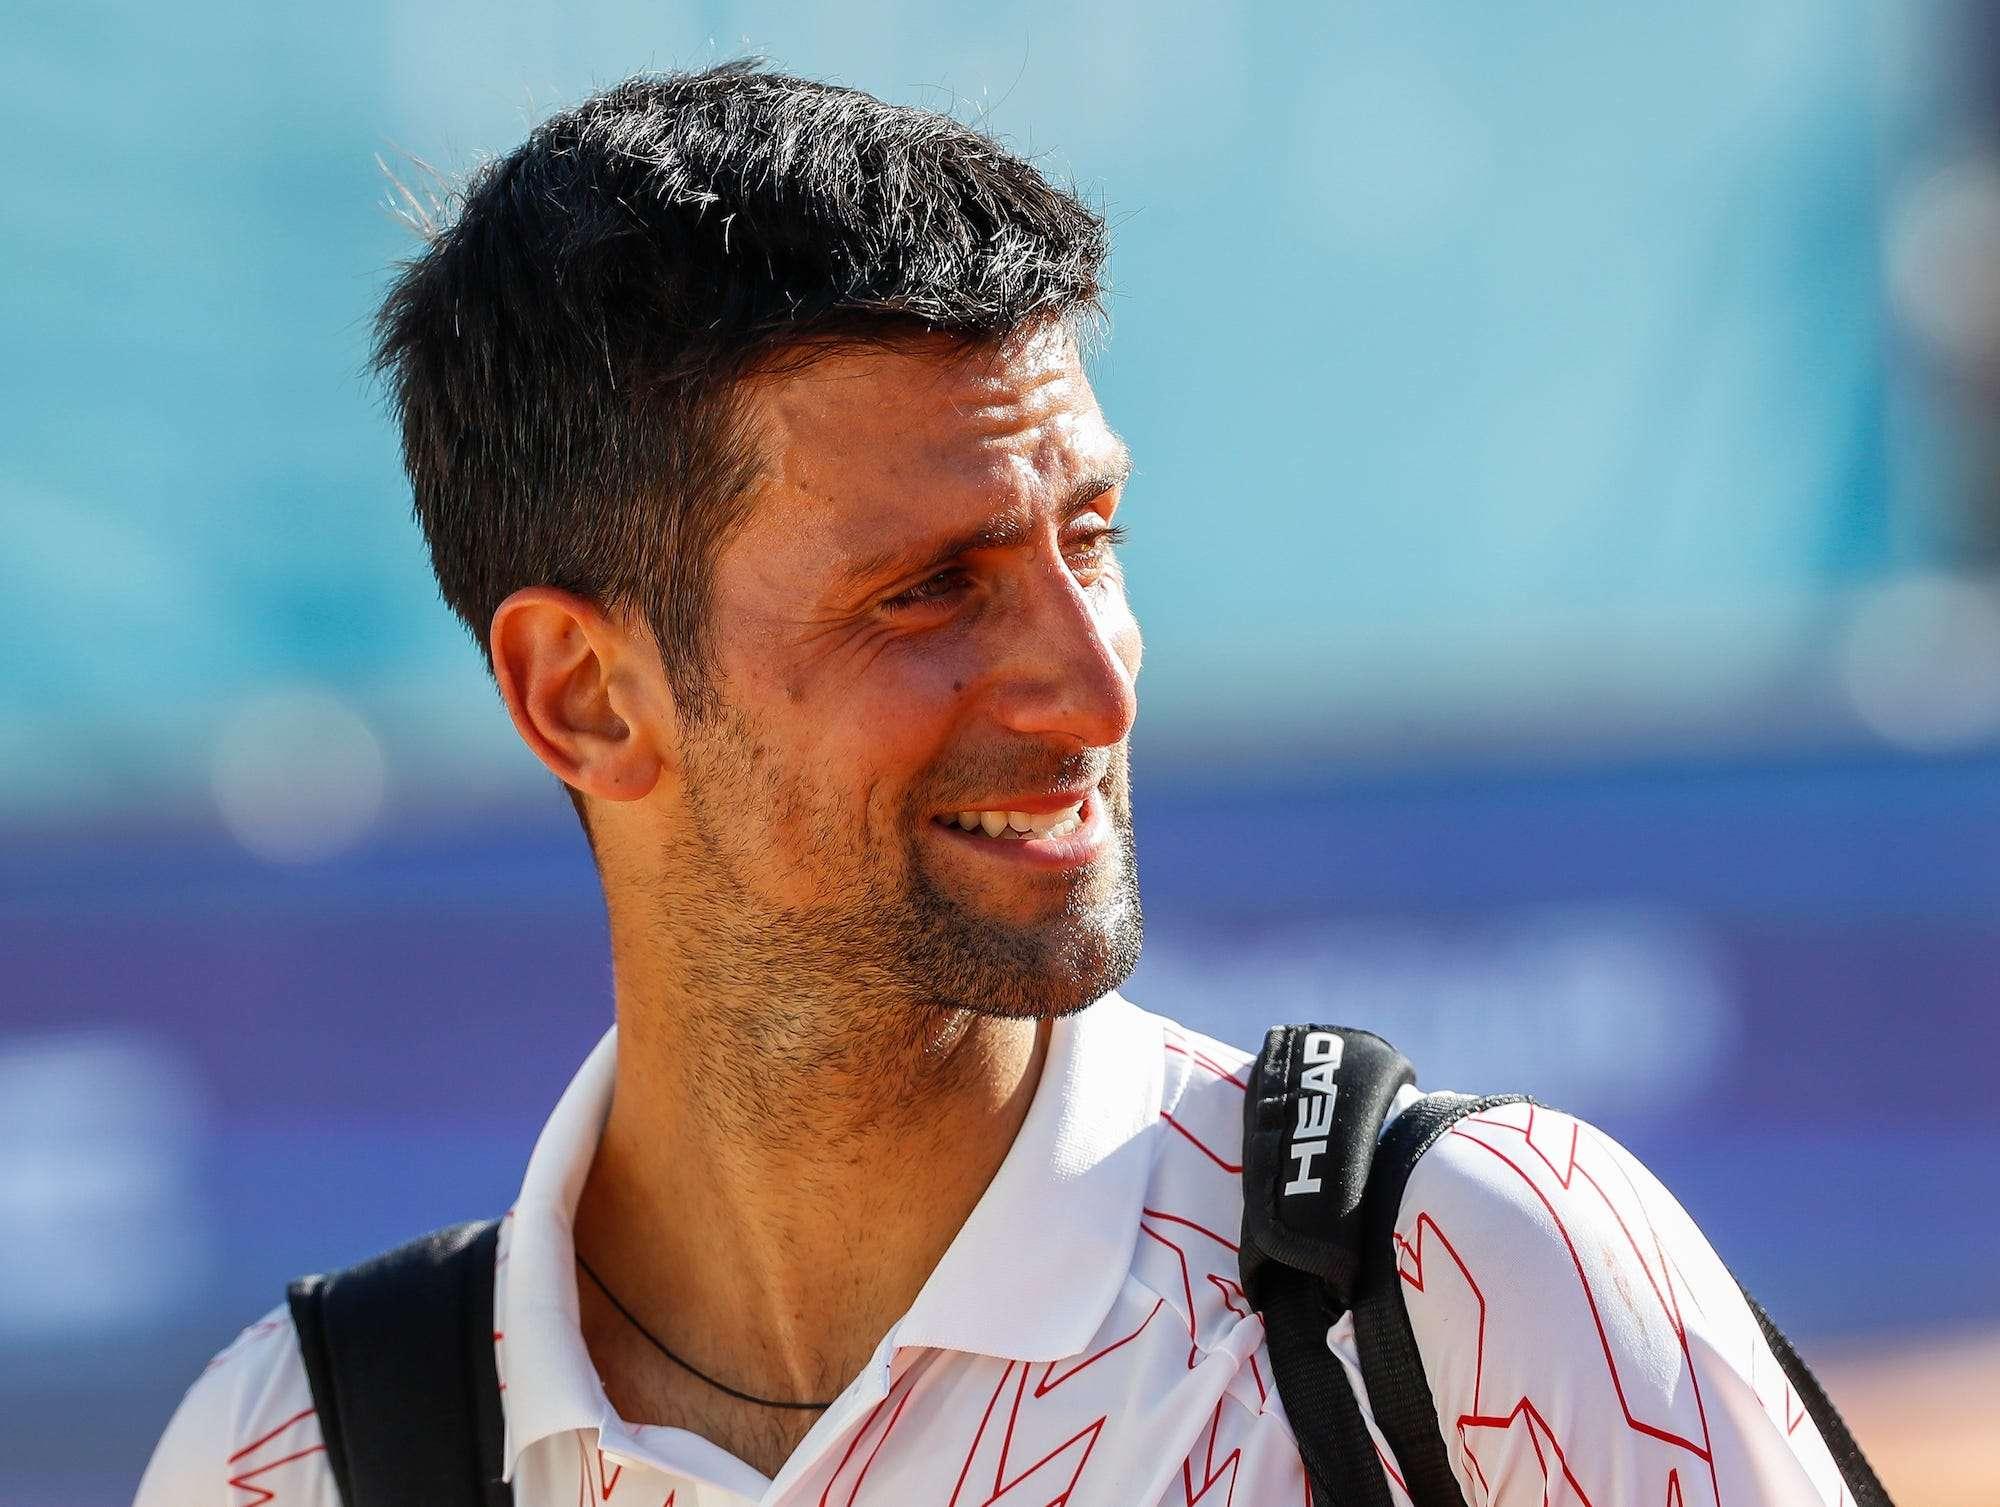 Novak Djokovic Coronavirus Tests Positive For After Night Of Partying Insider